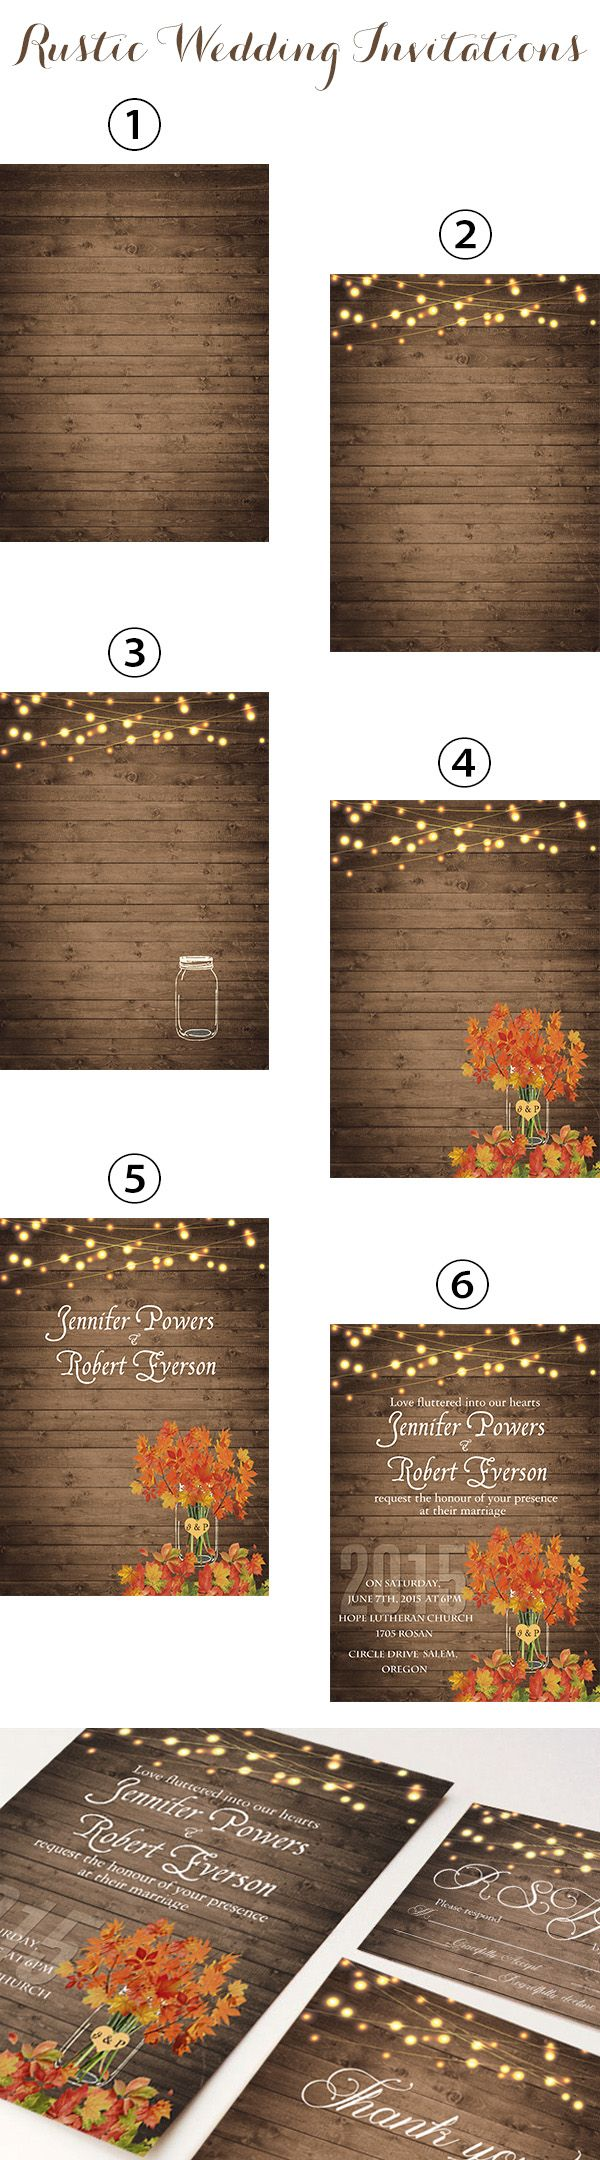 rustic fall wedding invitations inspired by mason jars and string lights backyard wedding ideas